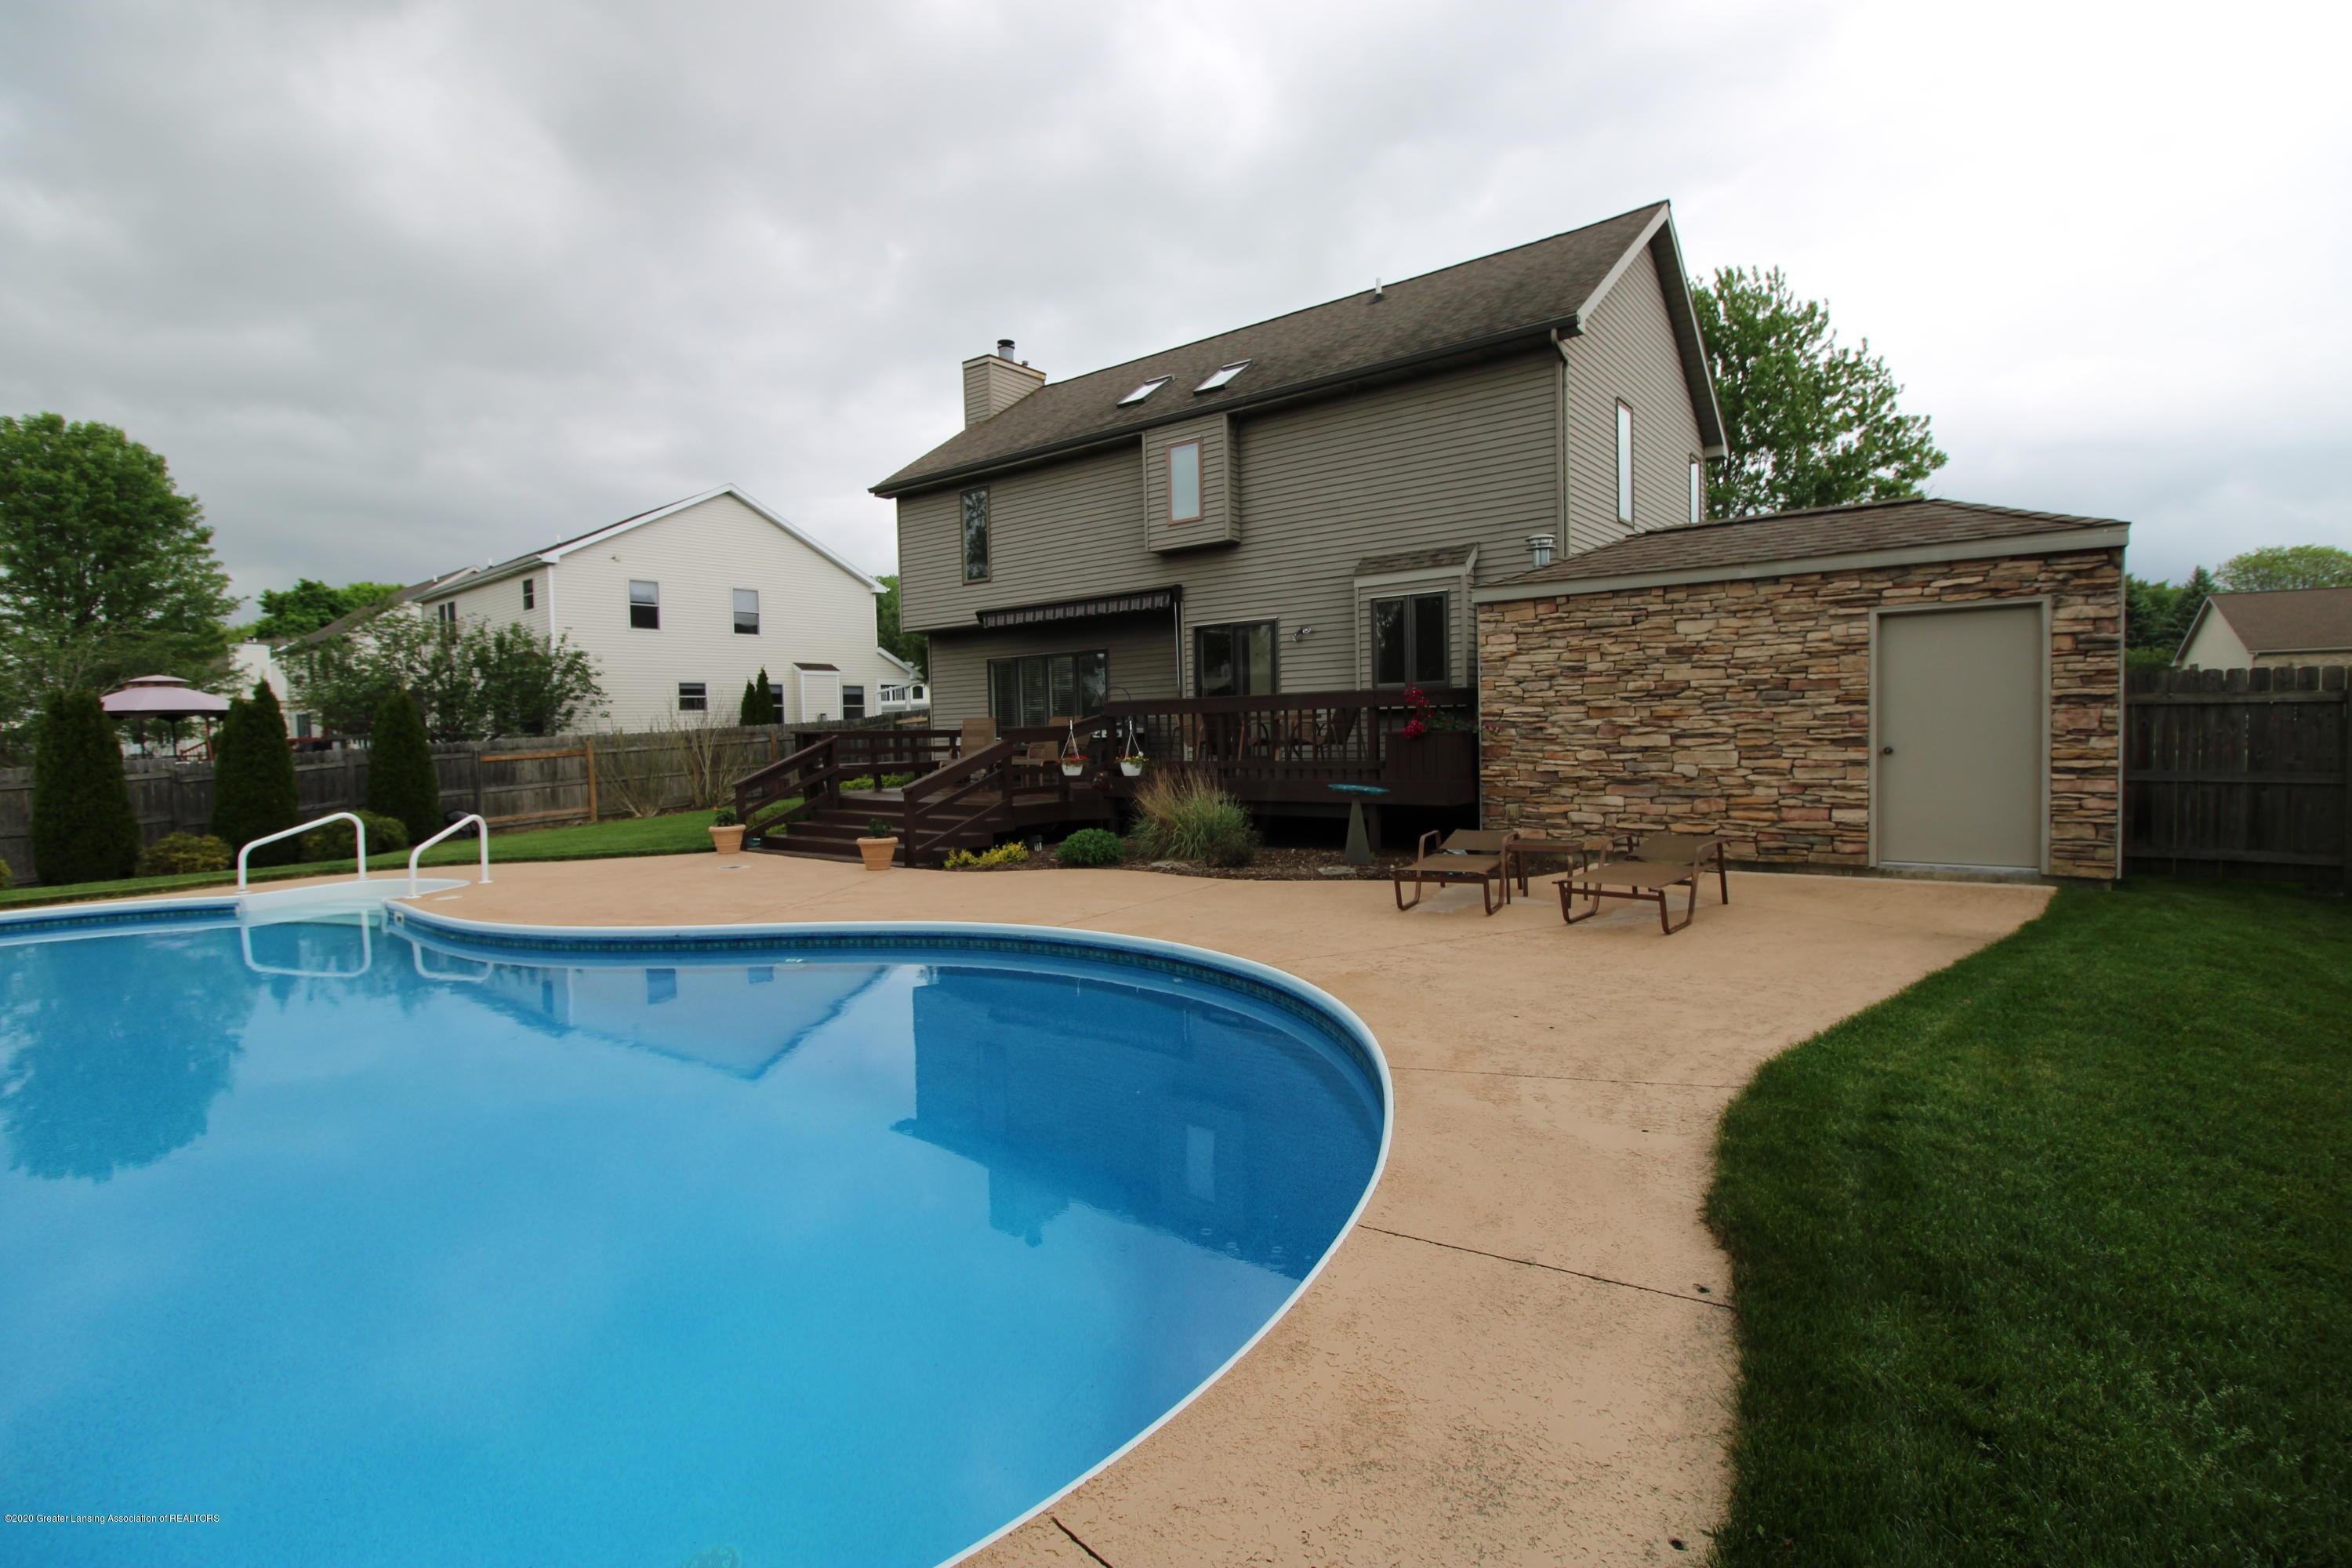 808 Powderhorn - 18. View of Pool House - 23